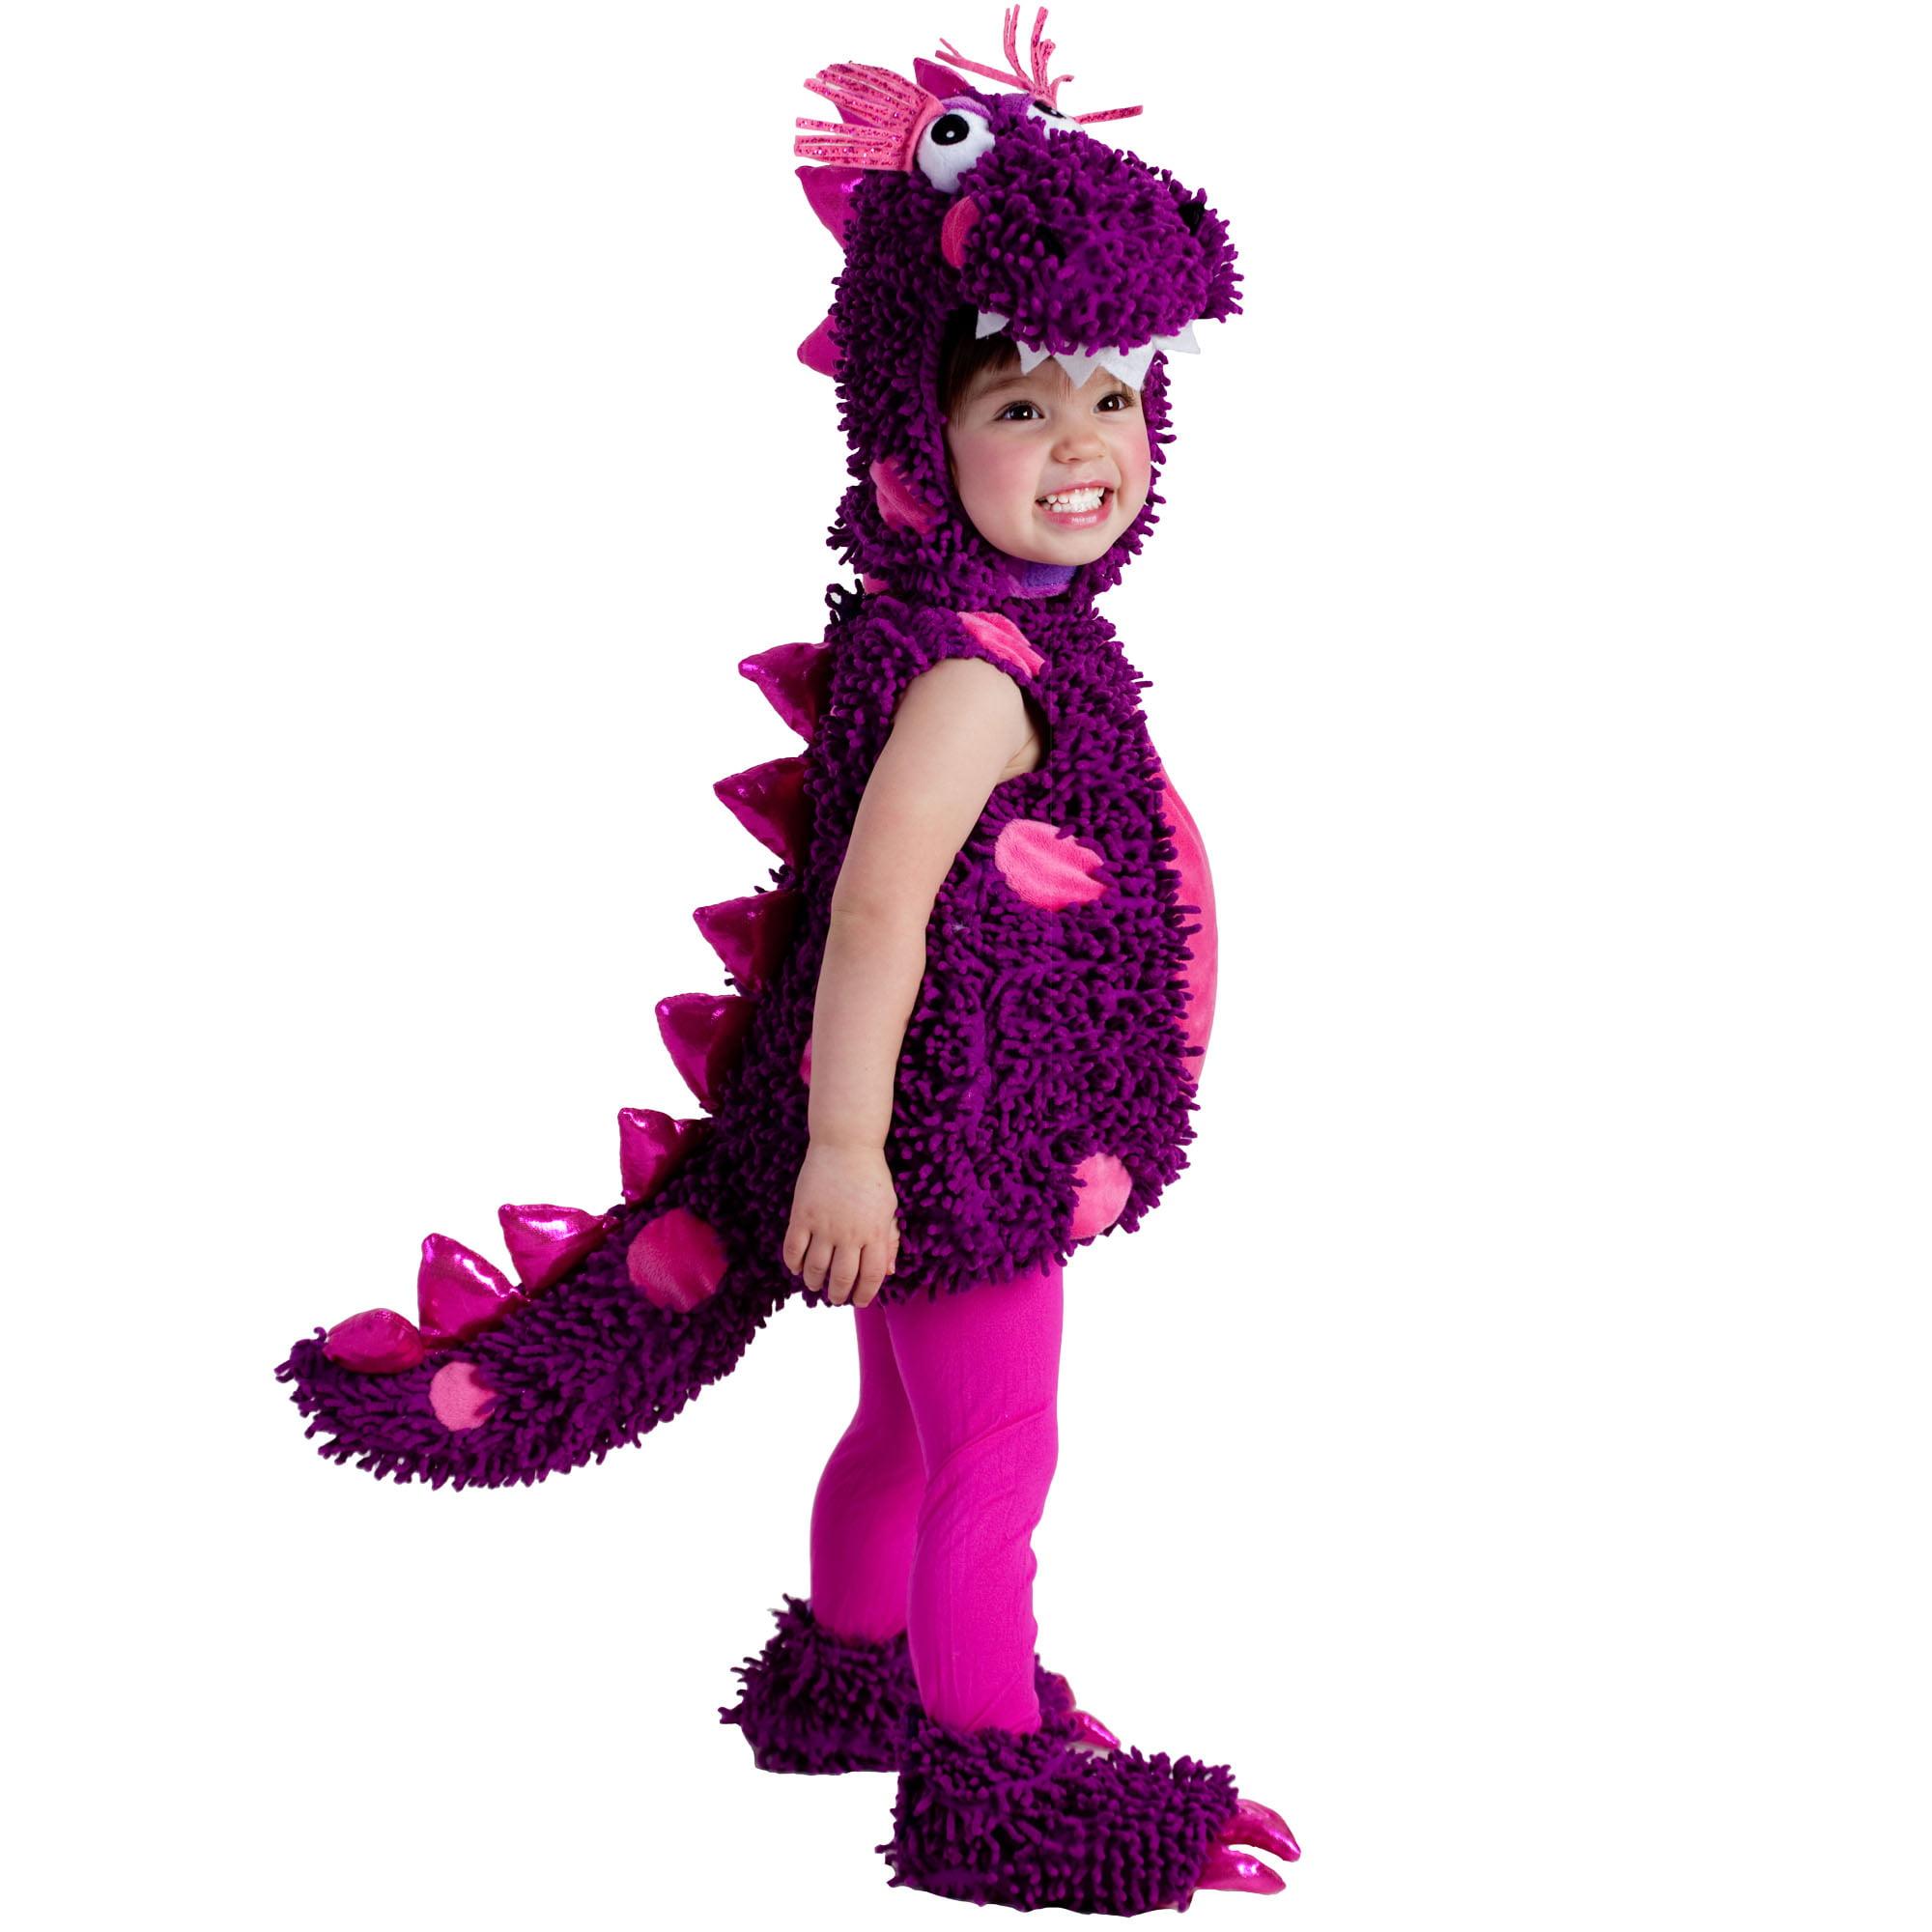 Princess Paradise Premium Paige the Dragon Toddler Costume